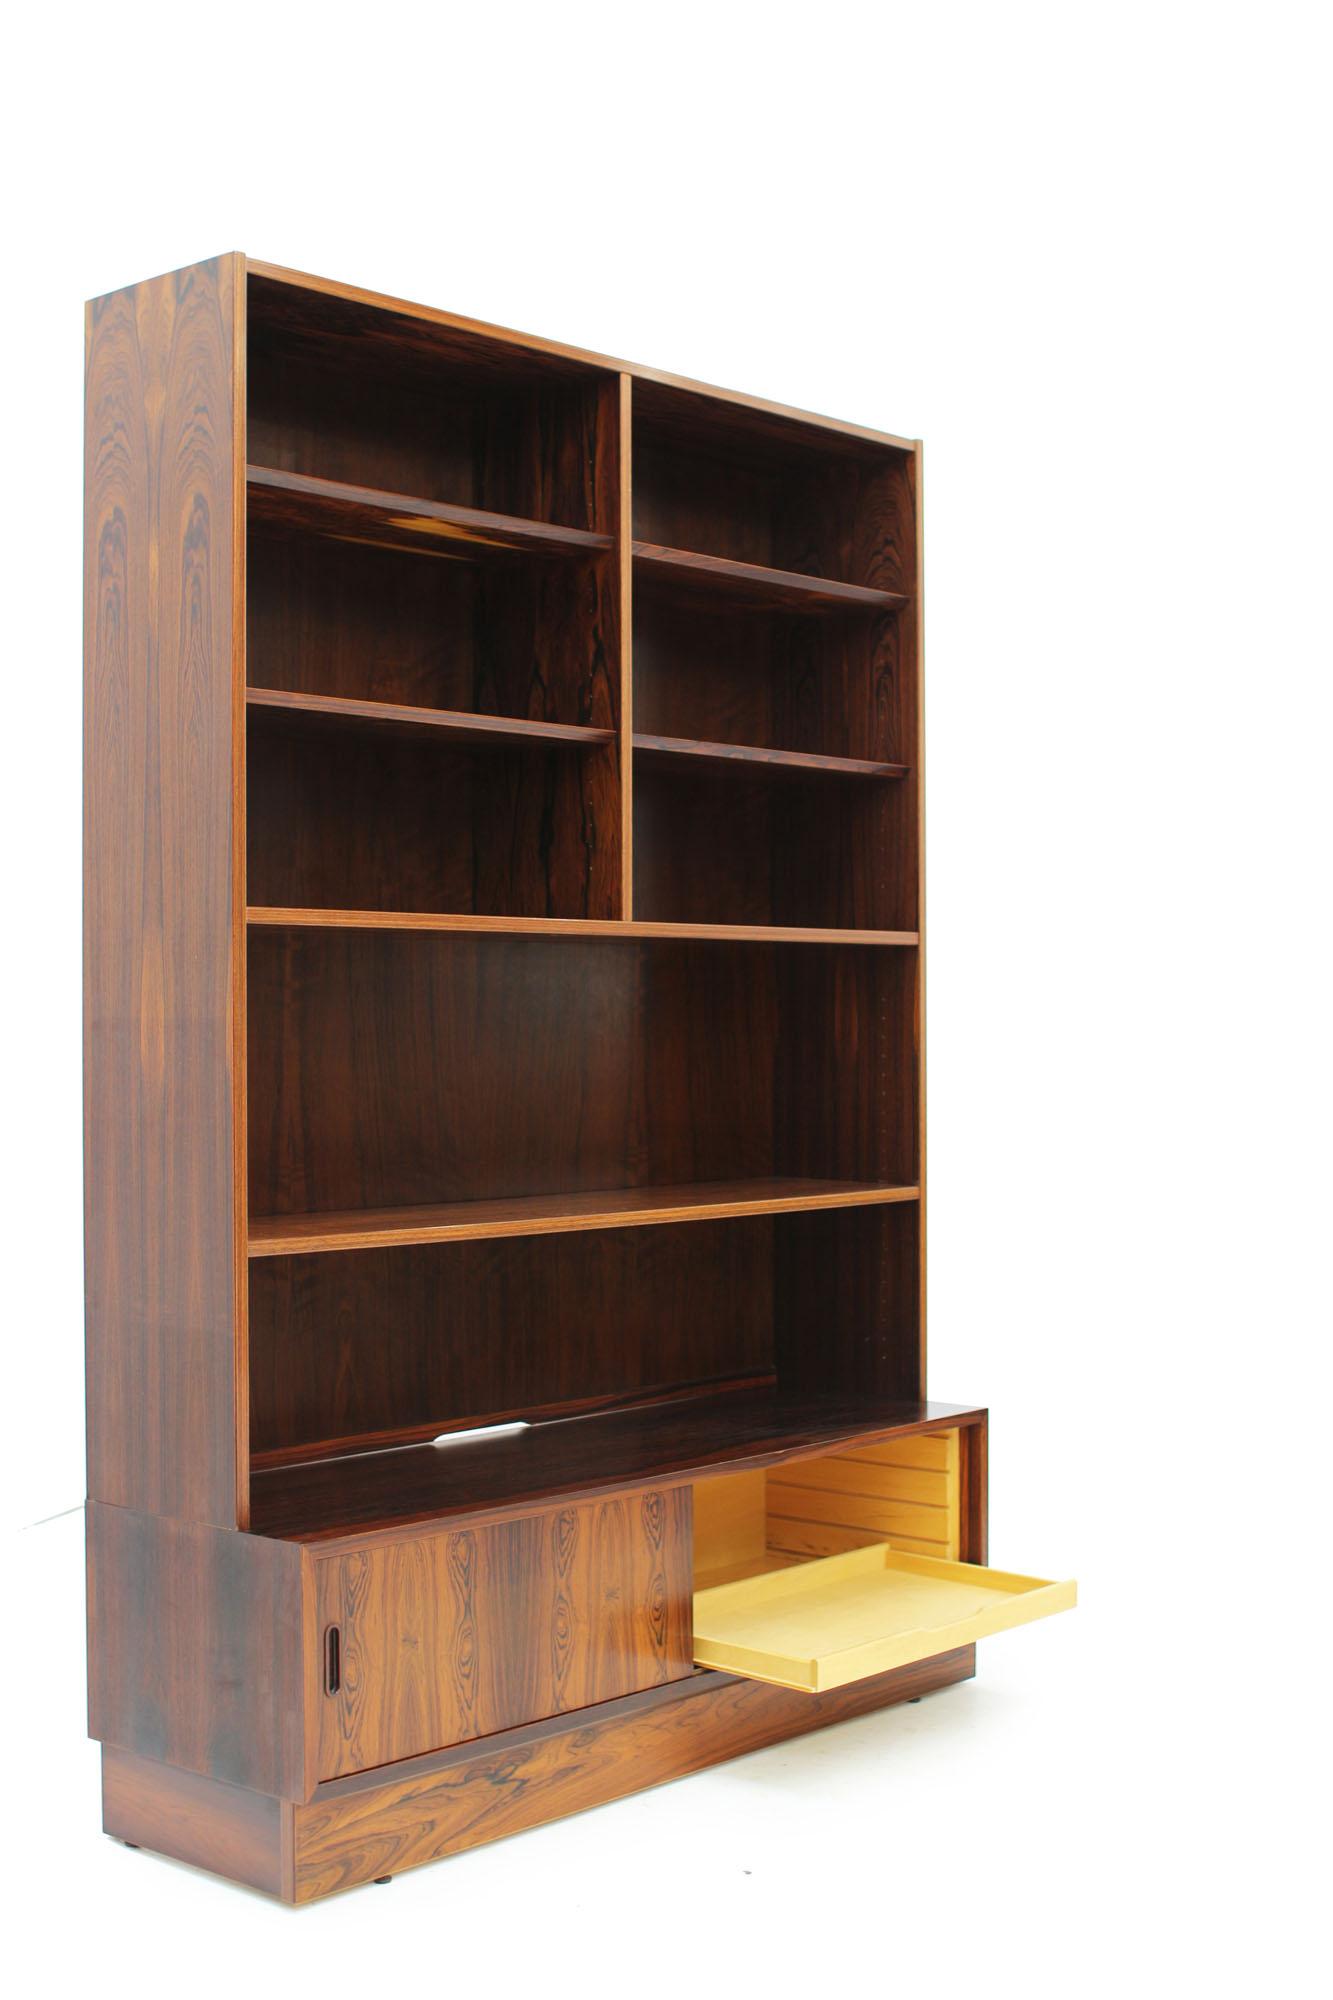 Poul Hundevad Rosewood Bookcase Made in Denmark (3).jpg